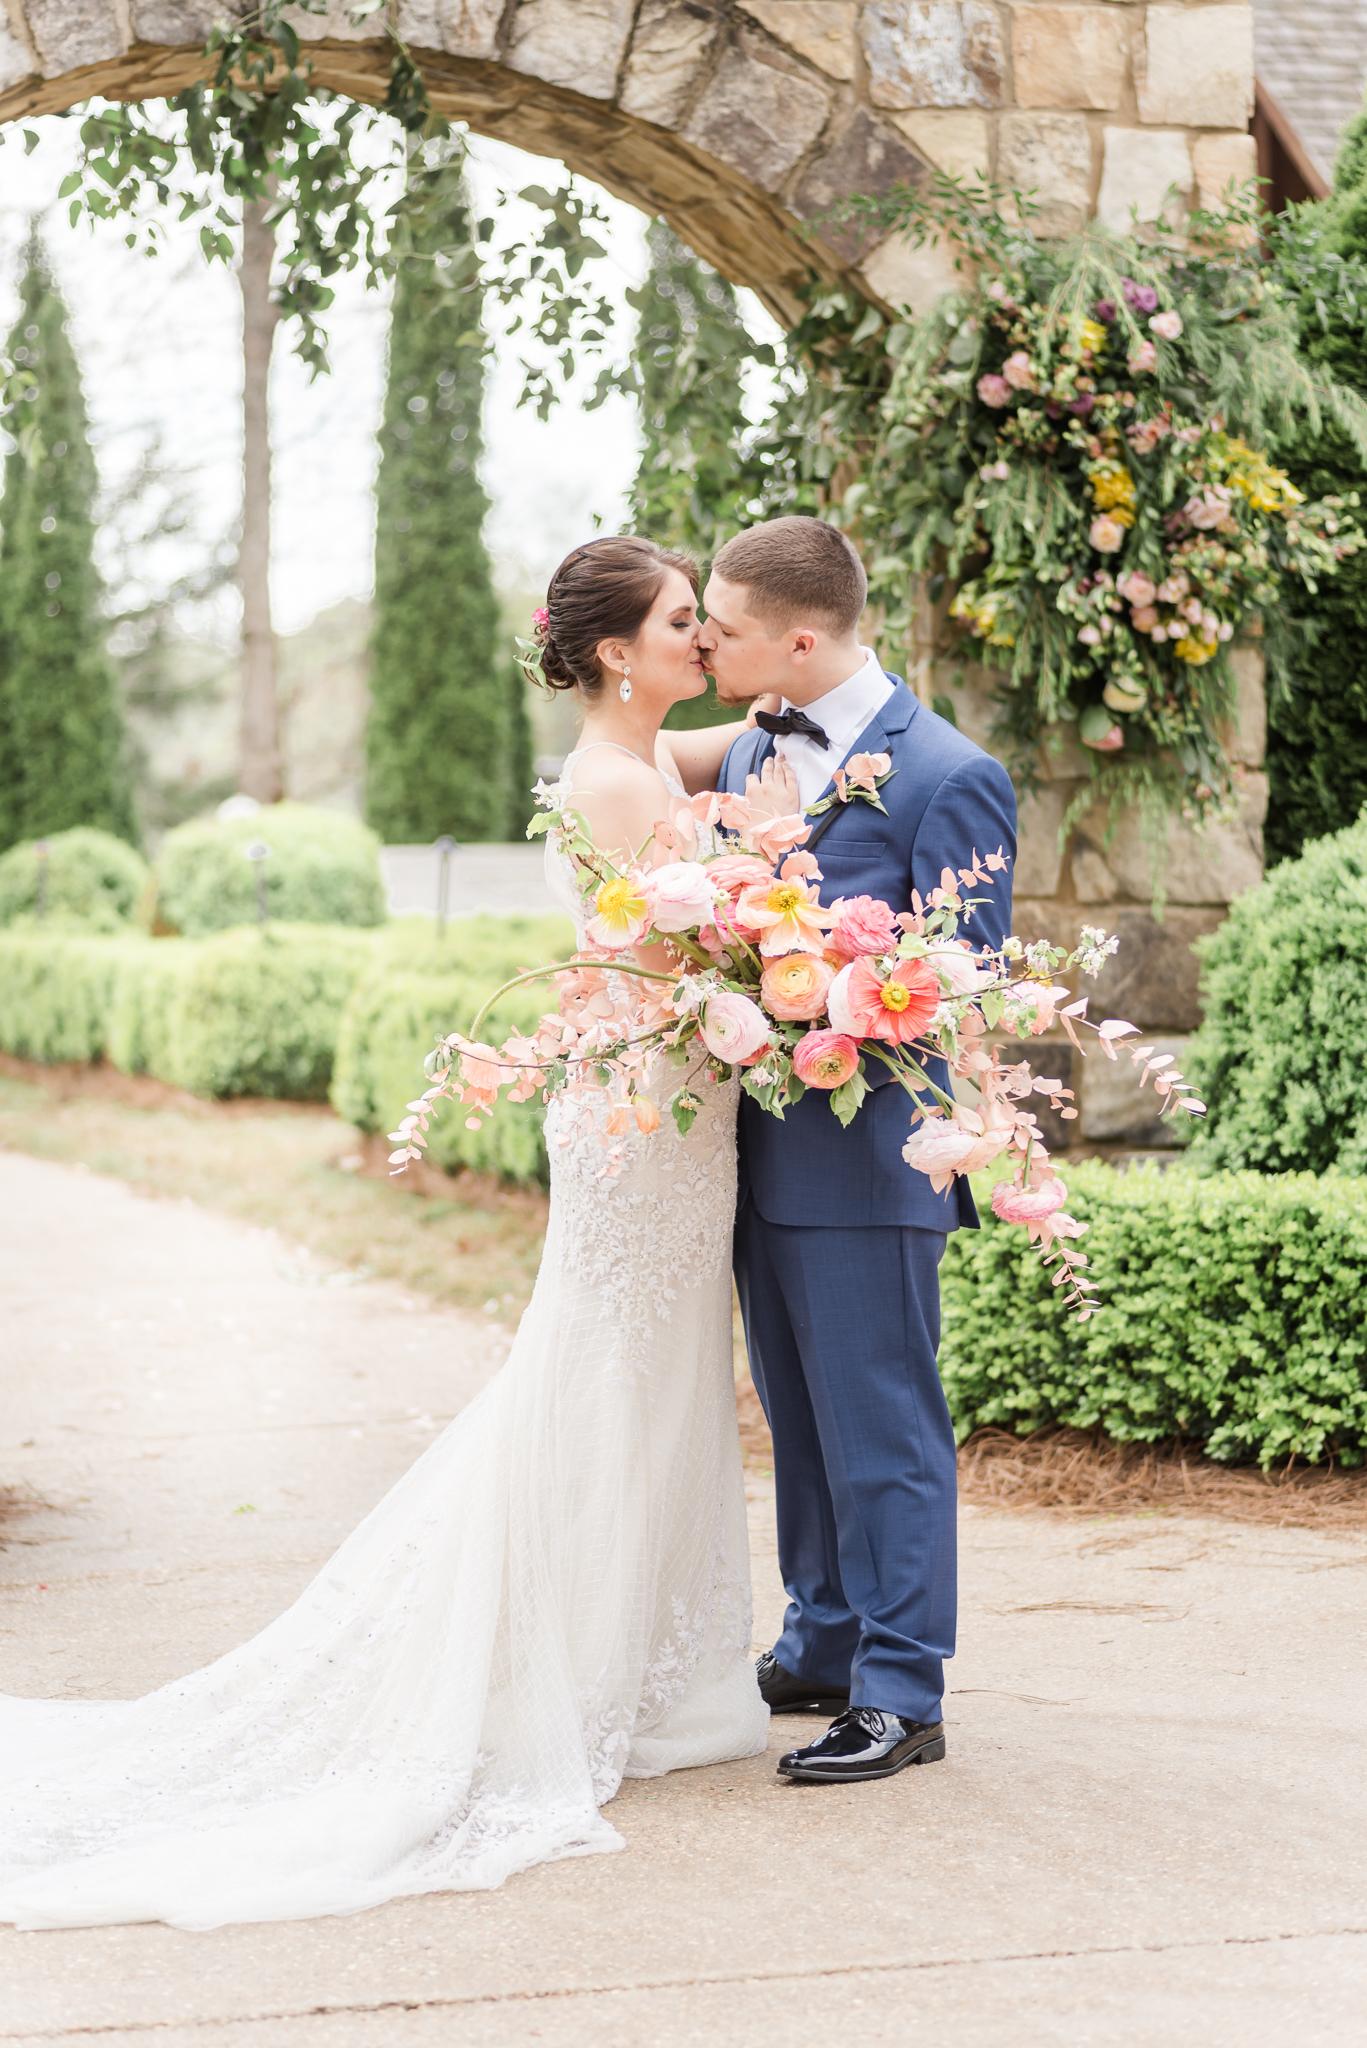 The Best Light and Airy Destination Wedding Photographers-4.jpg